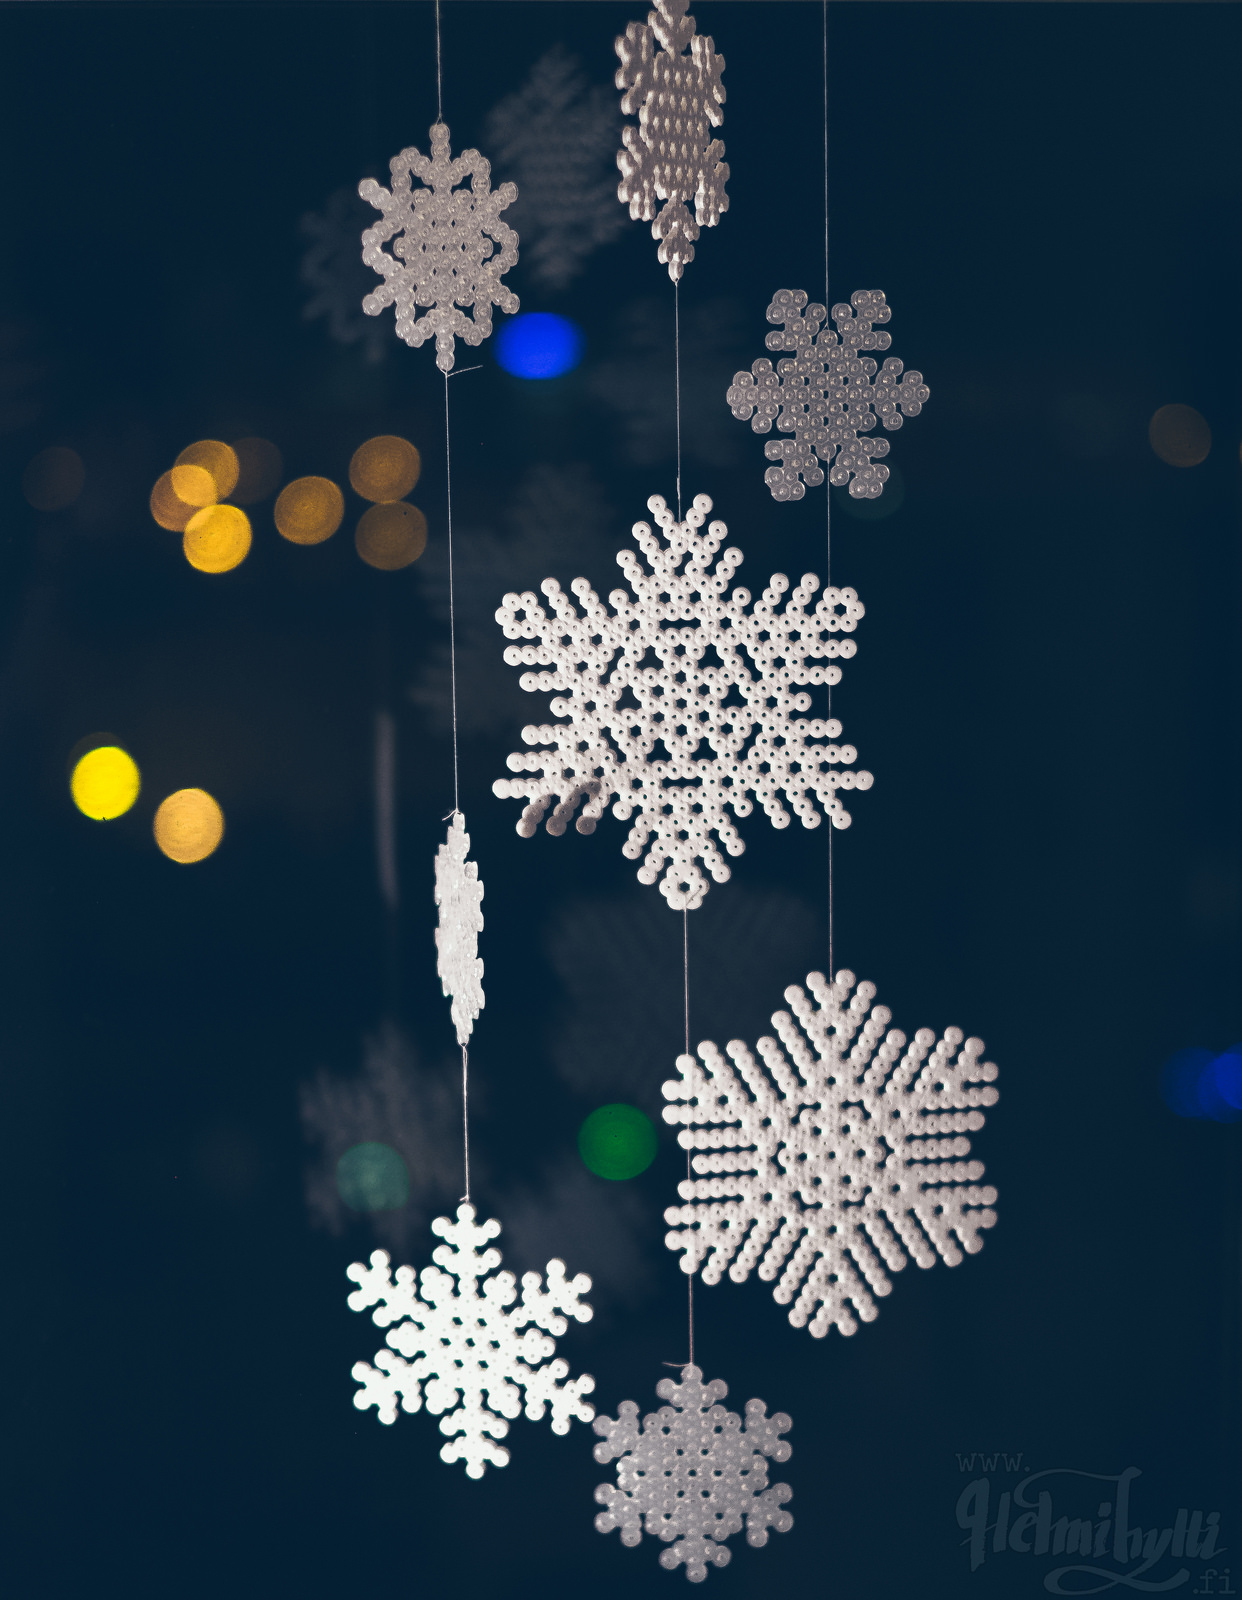 diy-hamahelmi-lumihiutaleet-joulu